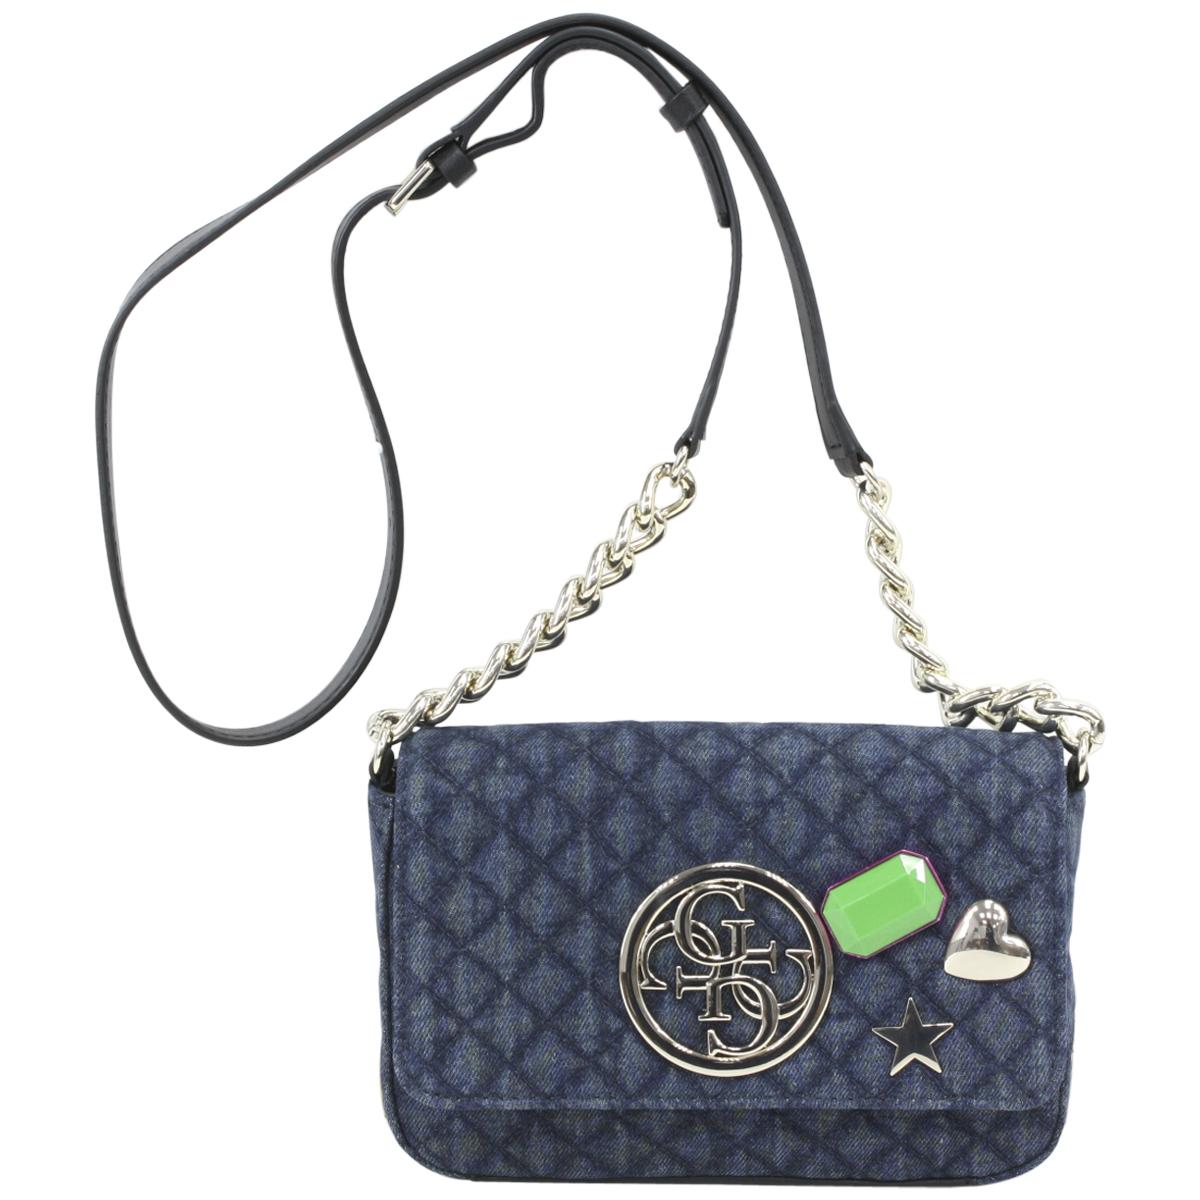 5160e5b341 Guess Women s G Lux Mini Quilted Flap-Over Crossbody Handbag